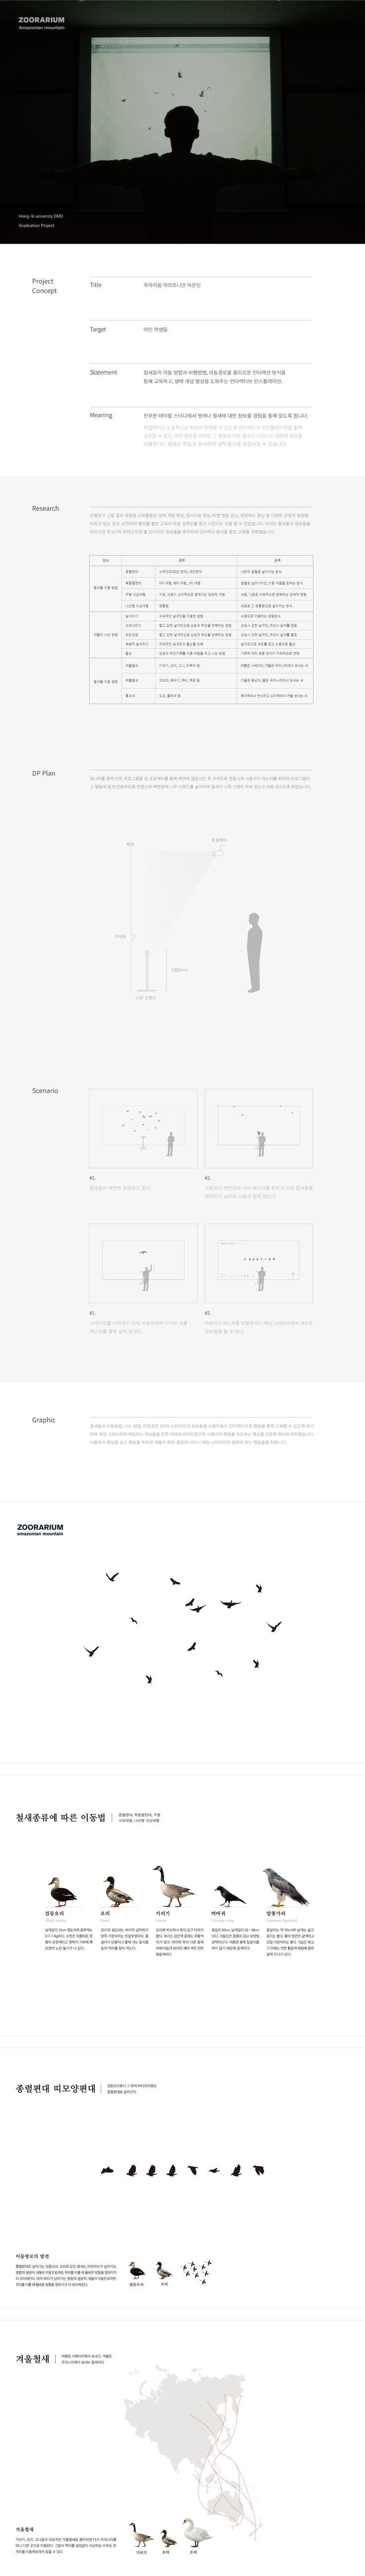 Yoon won suk, Lee jung woo | ZOORARIUM | Digital Media Design project Class 2017 | Major in Digital Media Design │#hicoda│hicoda.hongik.ac.kr